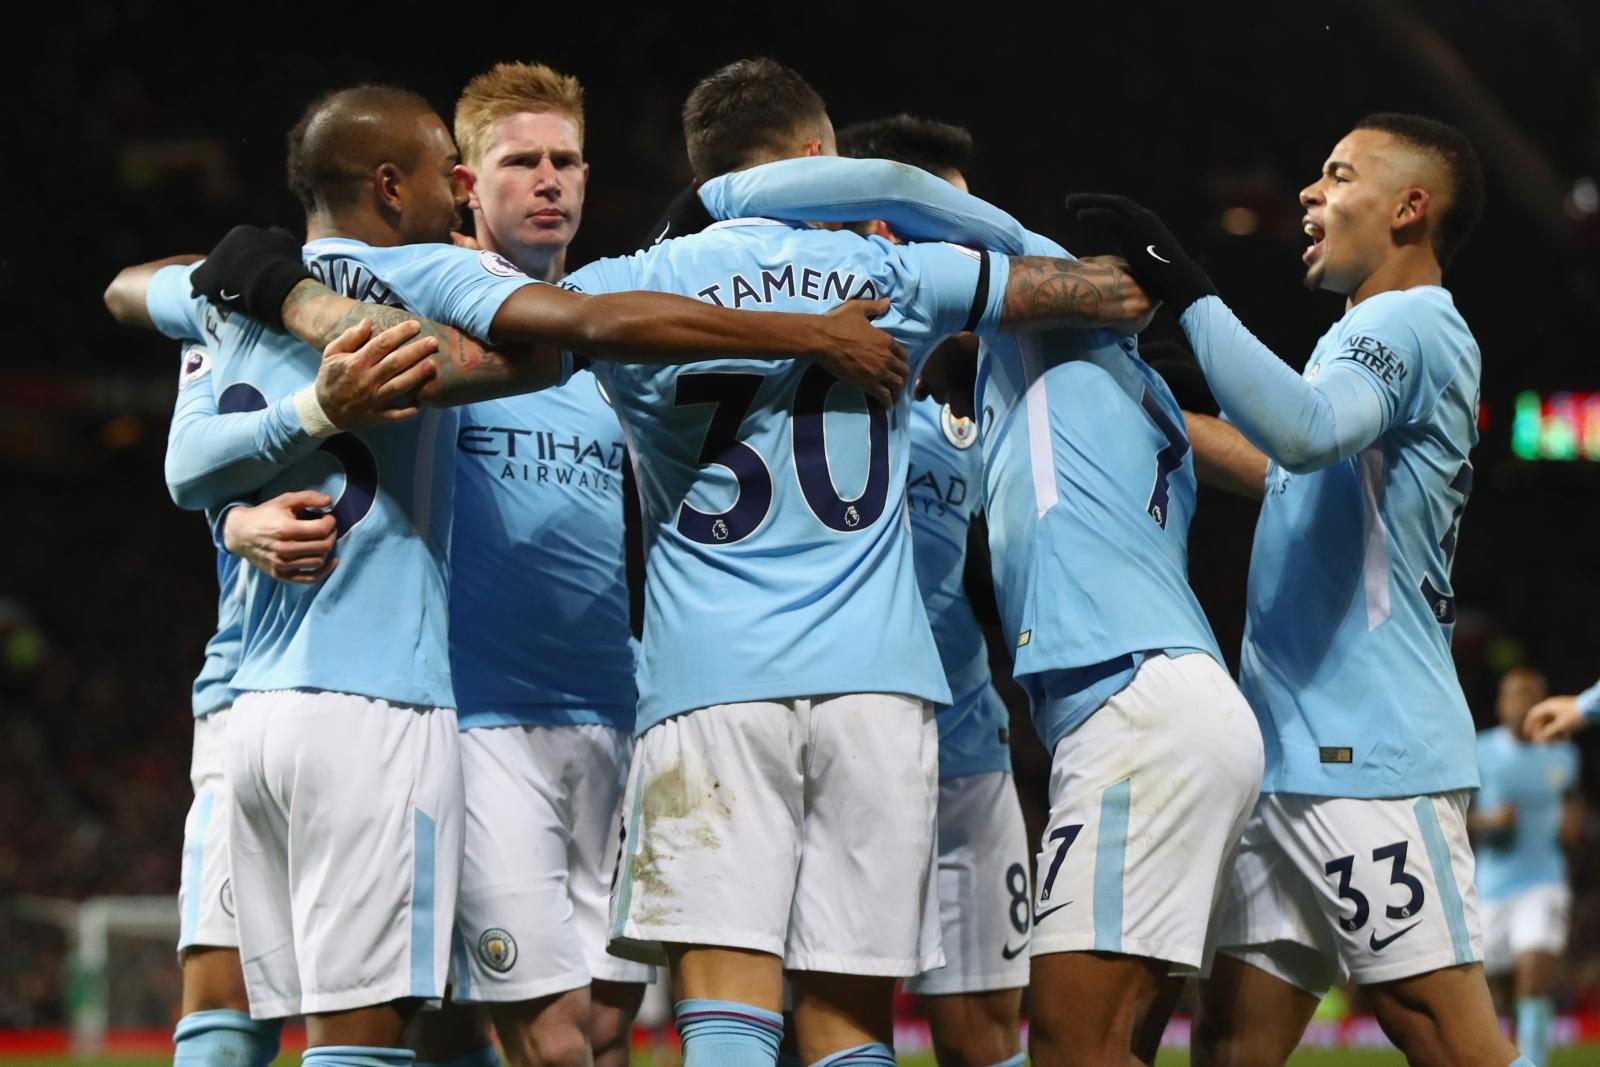 Manchester City: Manchester United 1-2 Manchester City: Otamendi And Silva